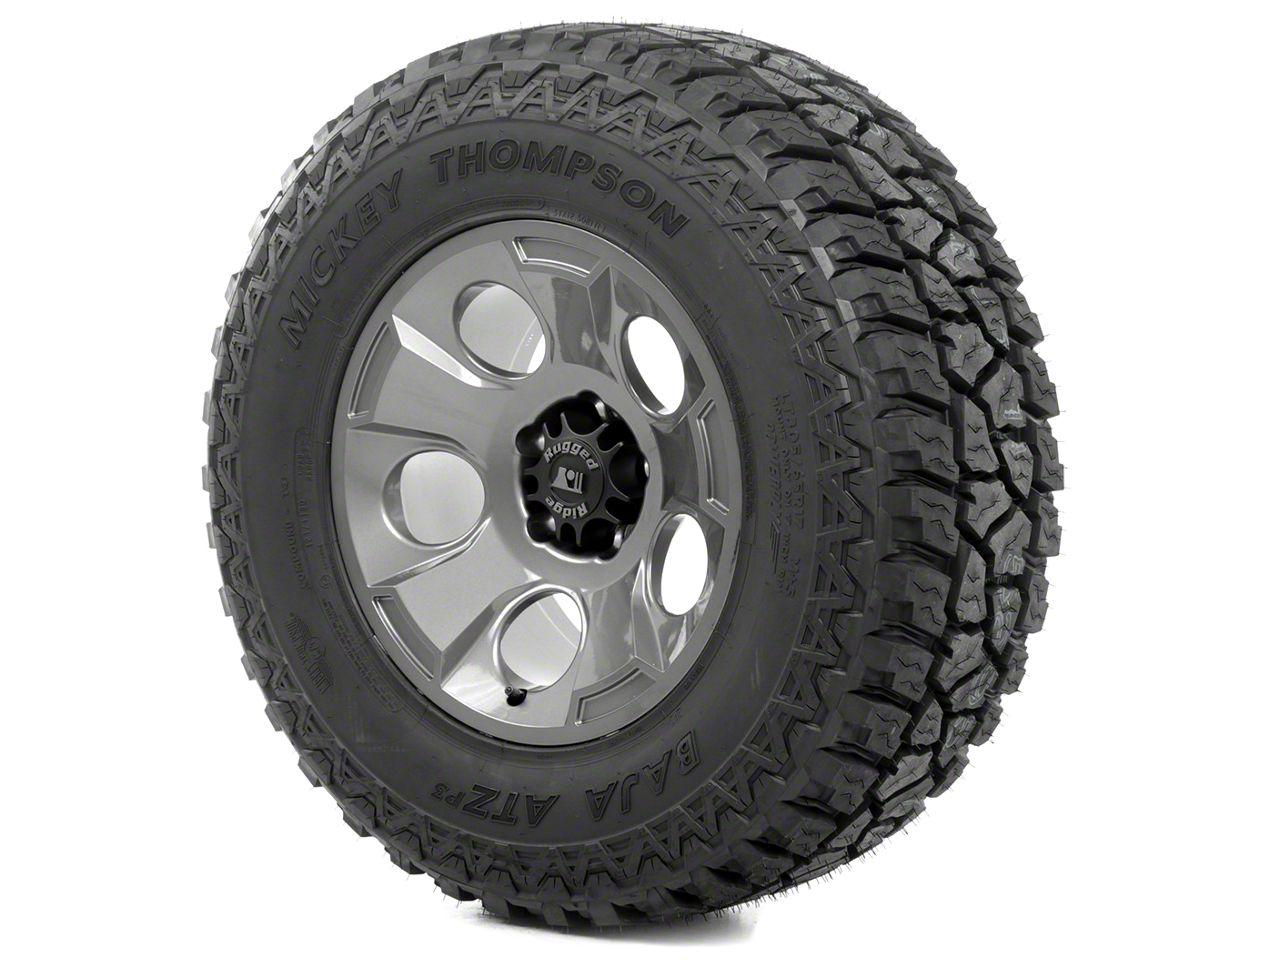 Rugged Ridge Drakon Wheel 17x9 Gun Metal and Mickey Thompson ATZ P3 315/70R17 Tire Kit (07-18 Jeep Wrangler JK)